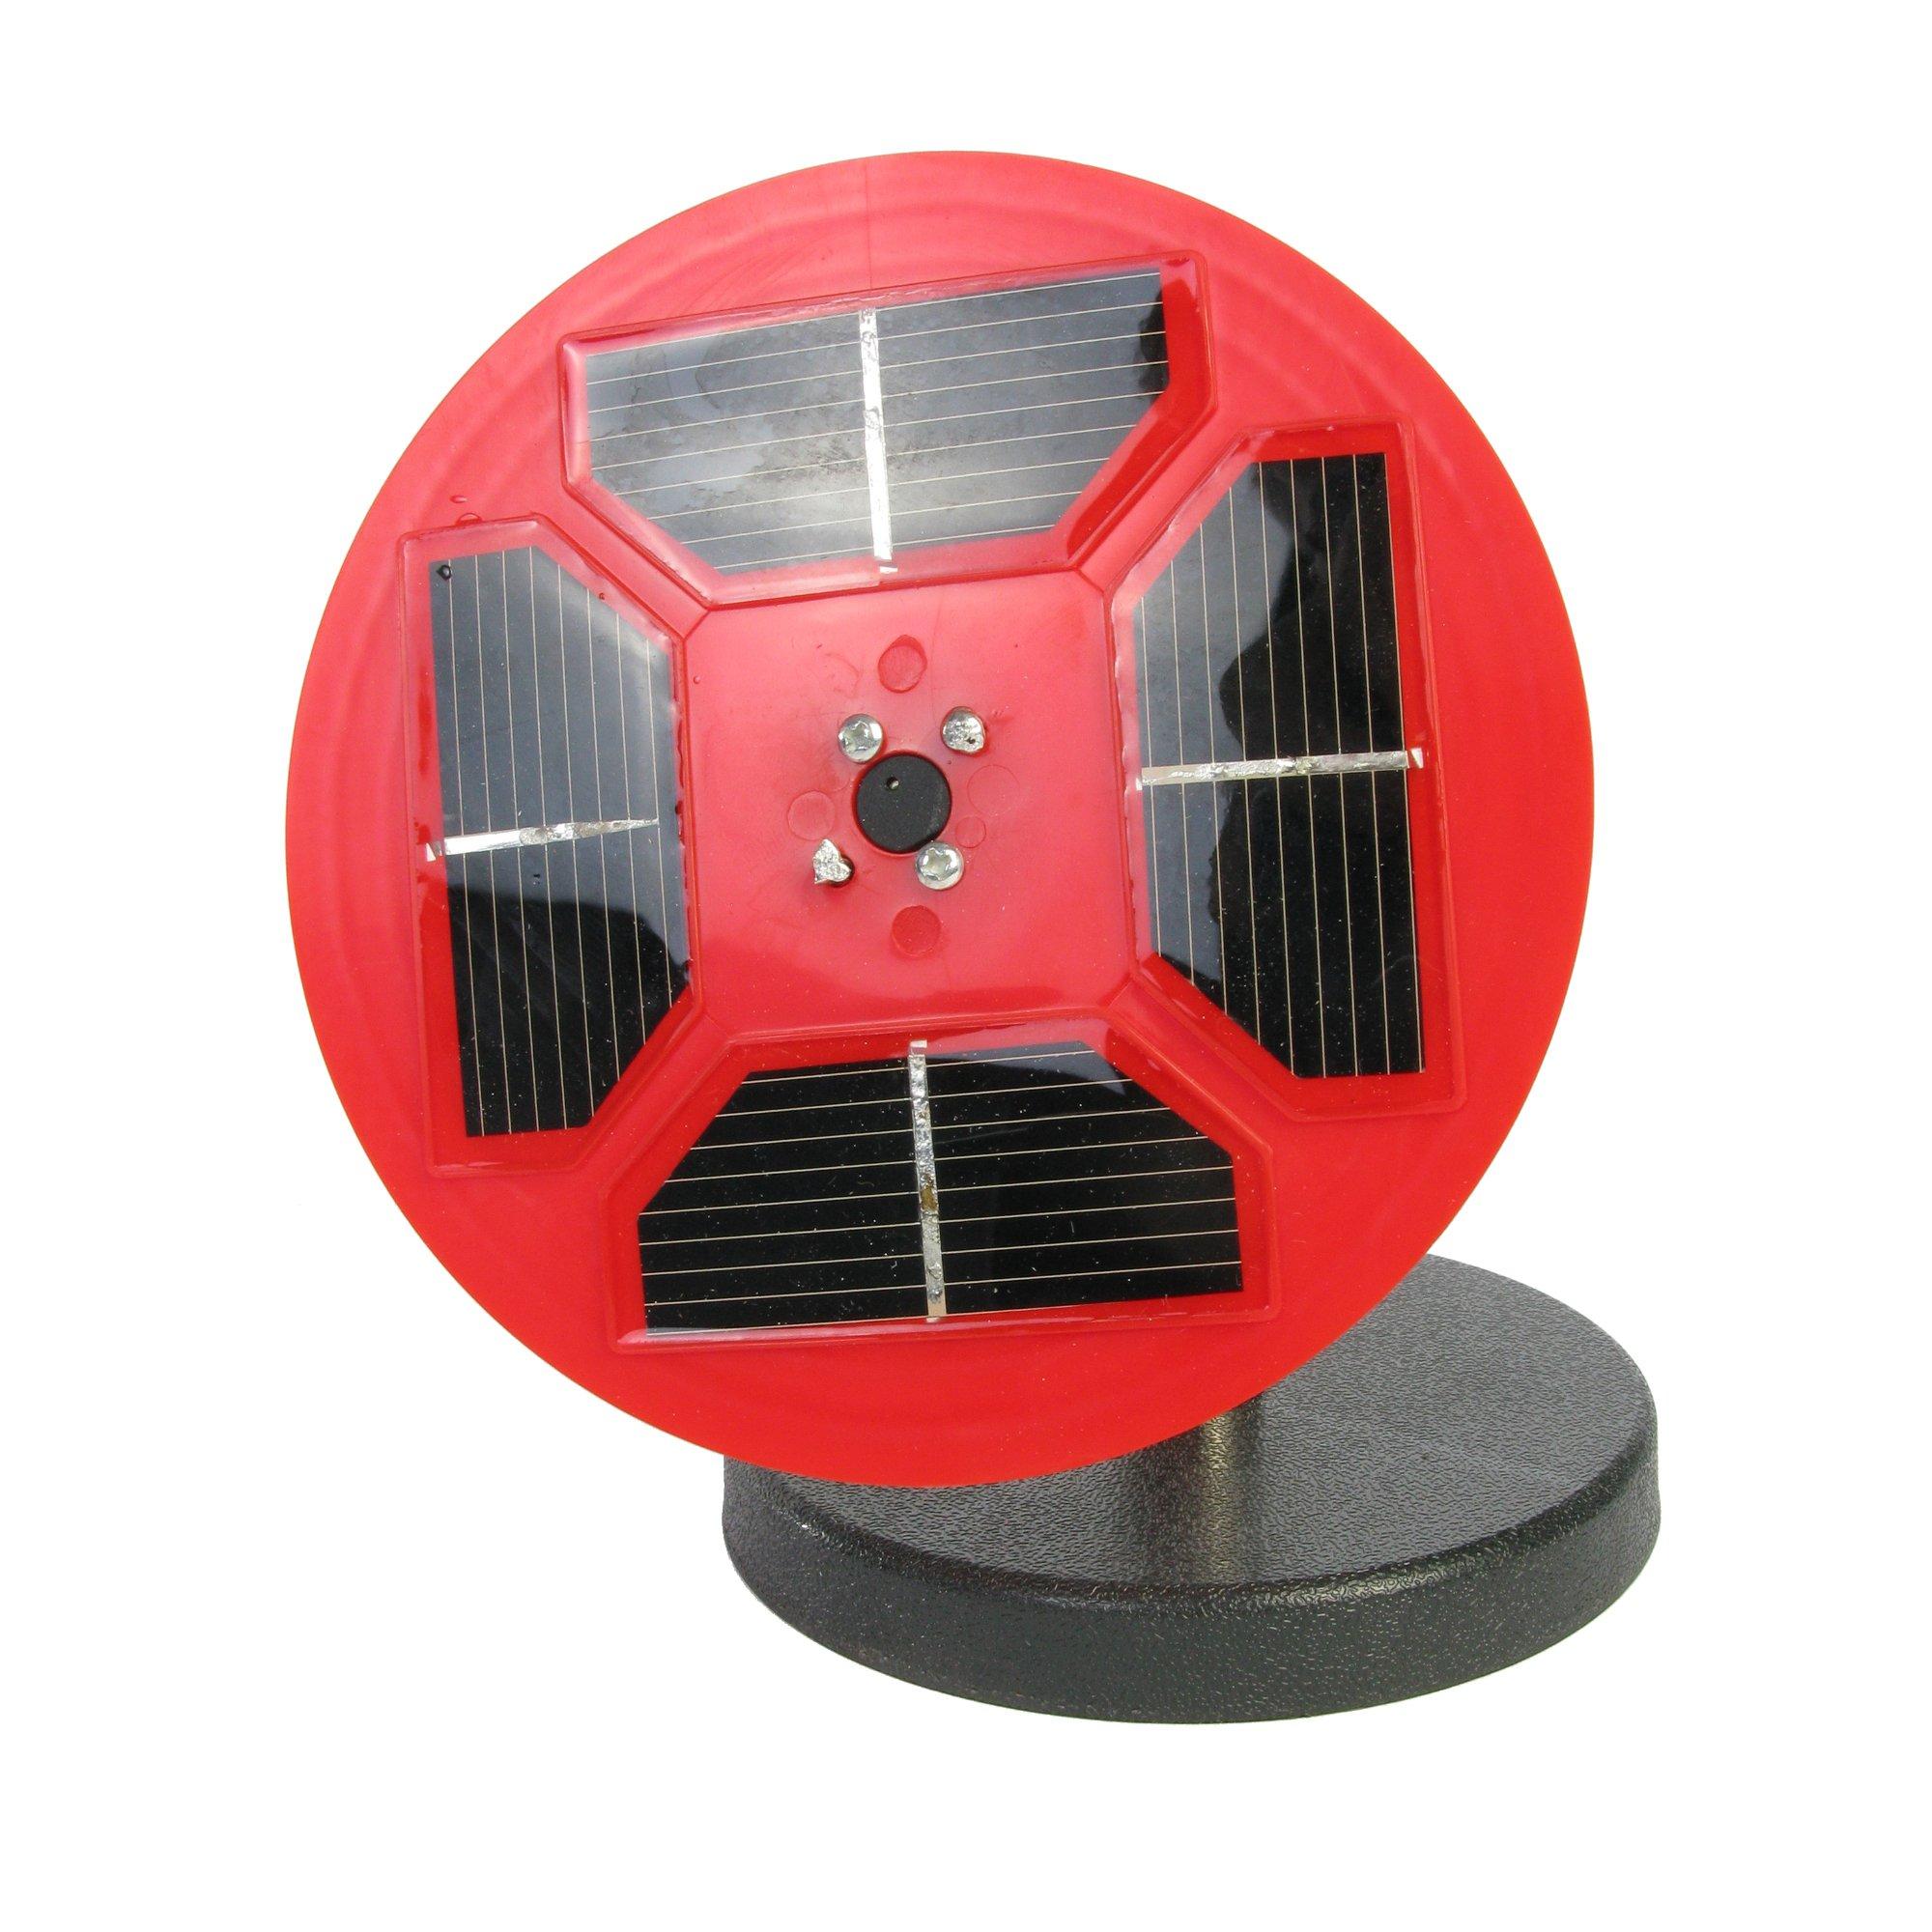 AMEP AEP718492 Solar Cell Demonstrator, Red/Black